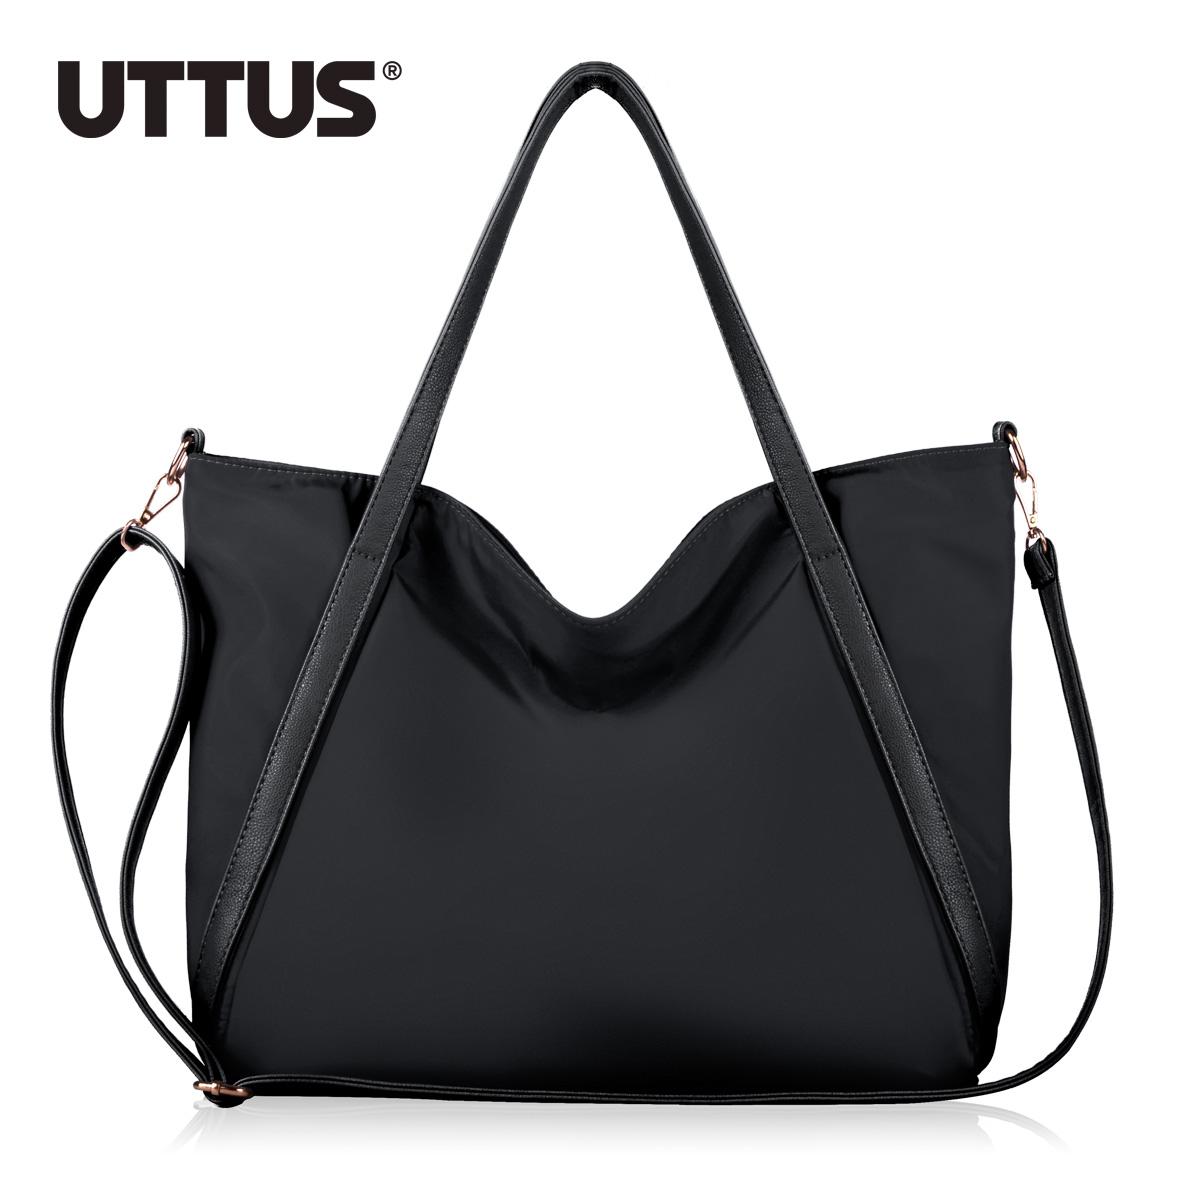 2015 New Women Large Handbags Nylon Trendy Handbags Summer Used Luxury Handbags for Women Casual Canvas Bags Ladies Hot Sale(China (Mainland))